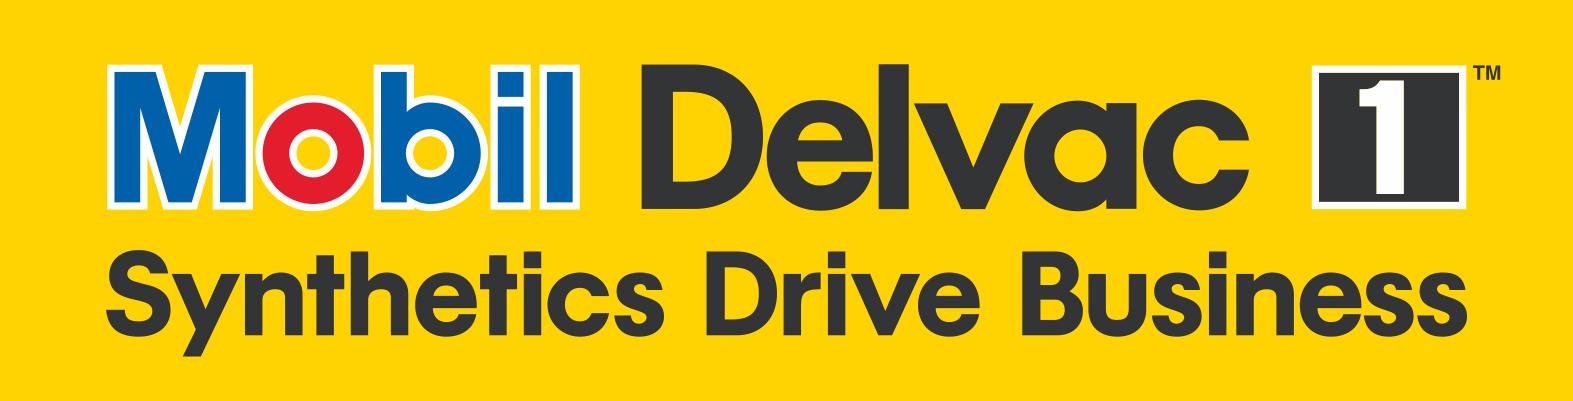 mobil delvac 1_logo